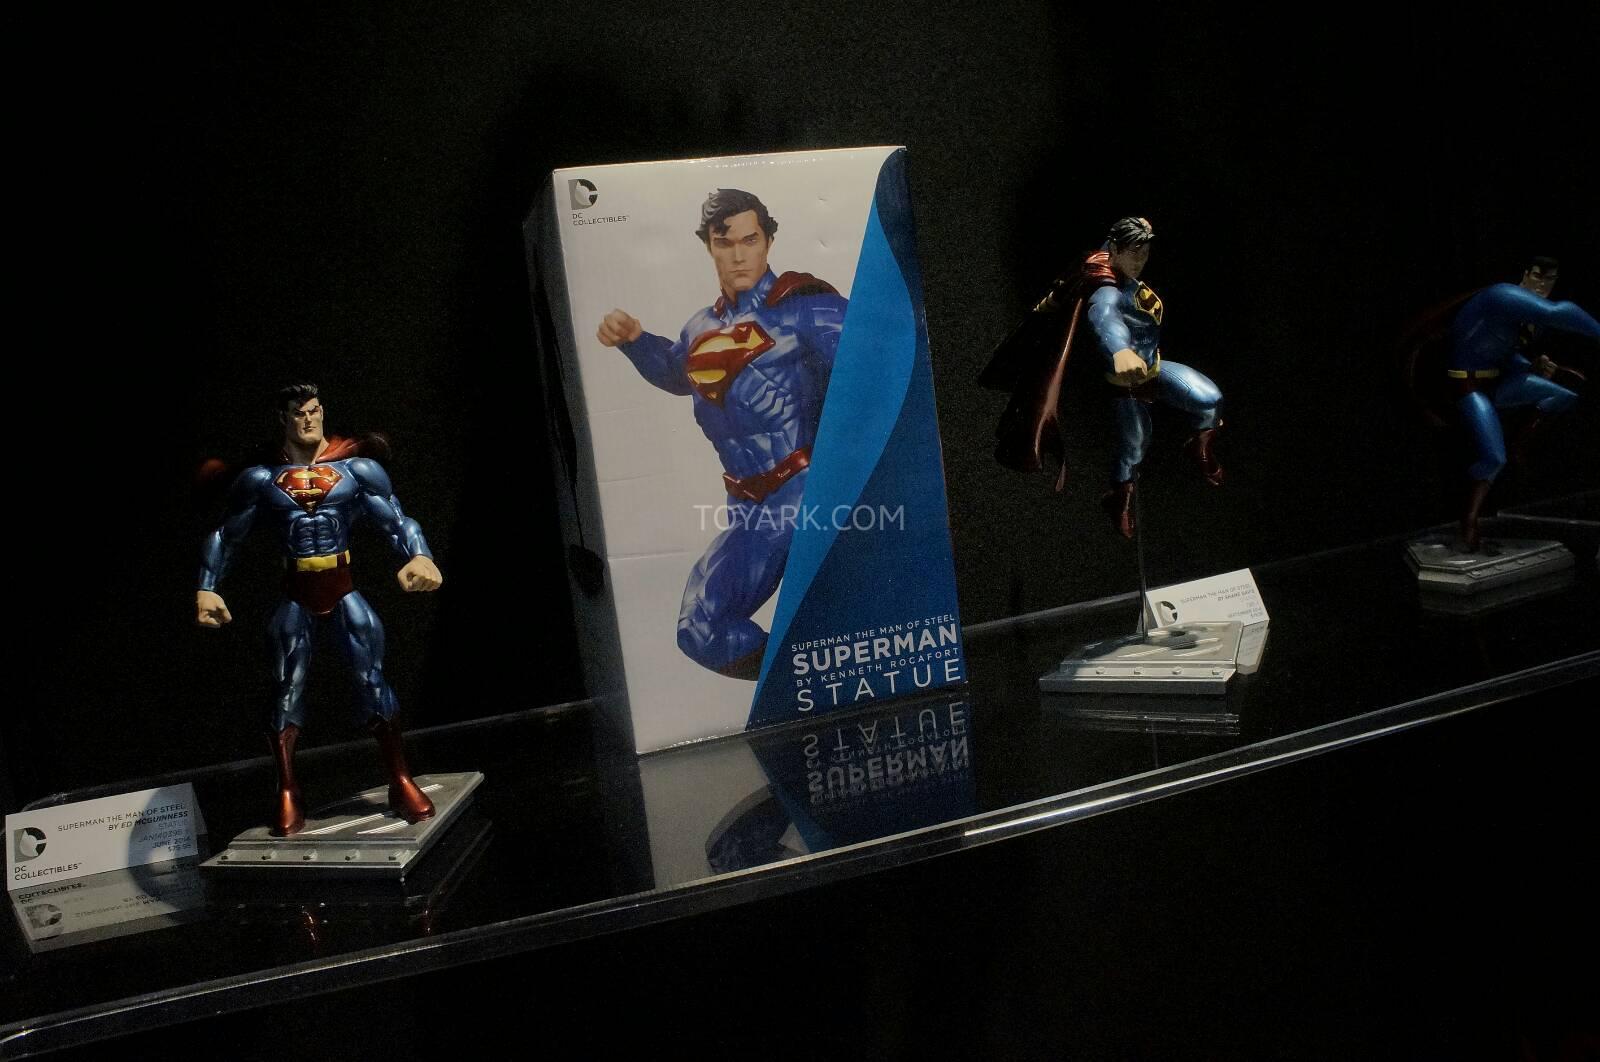 [Toy Fair 2014] DC Collectibles Toy-Fair-2014-DC-Collectibles-007